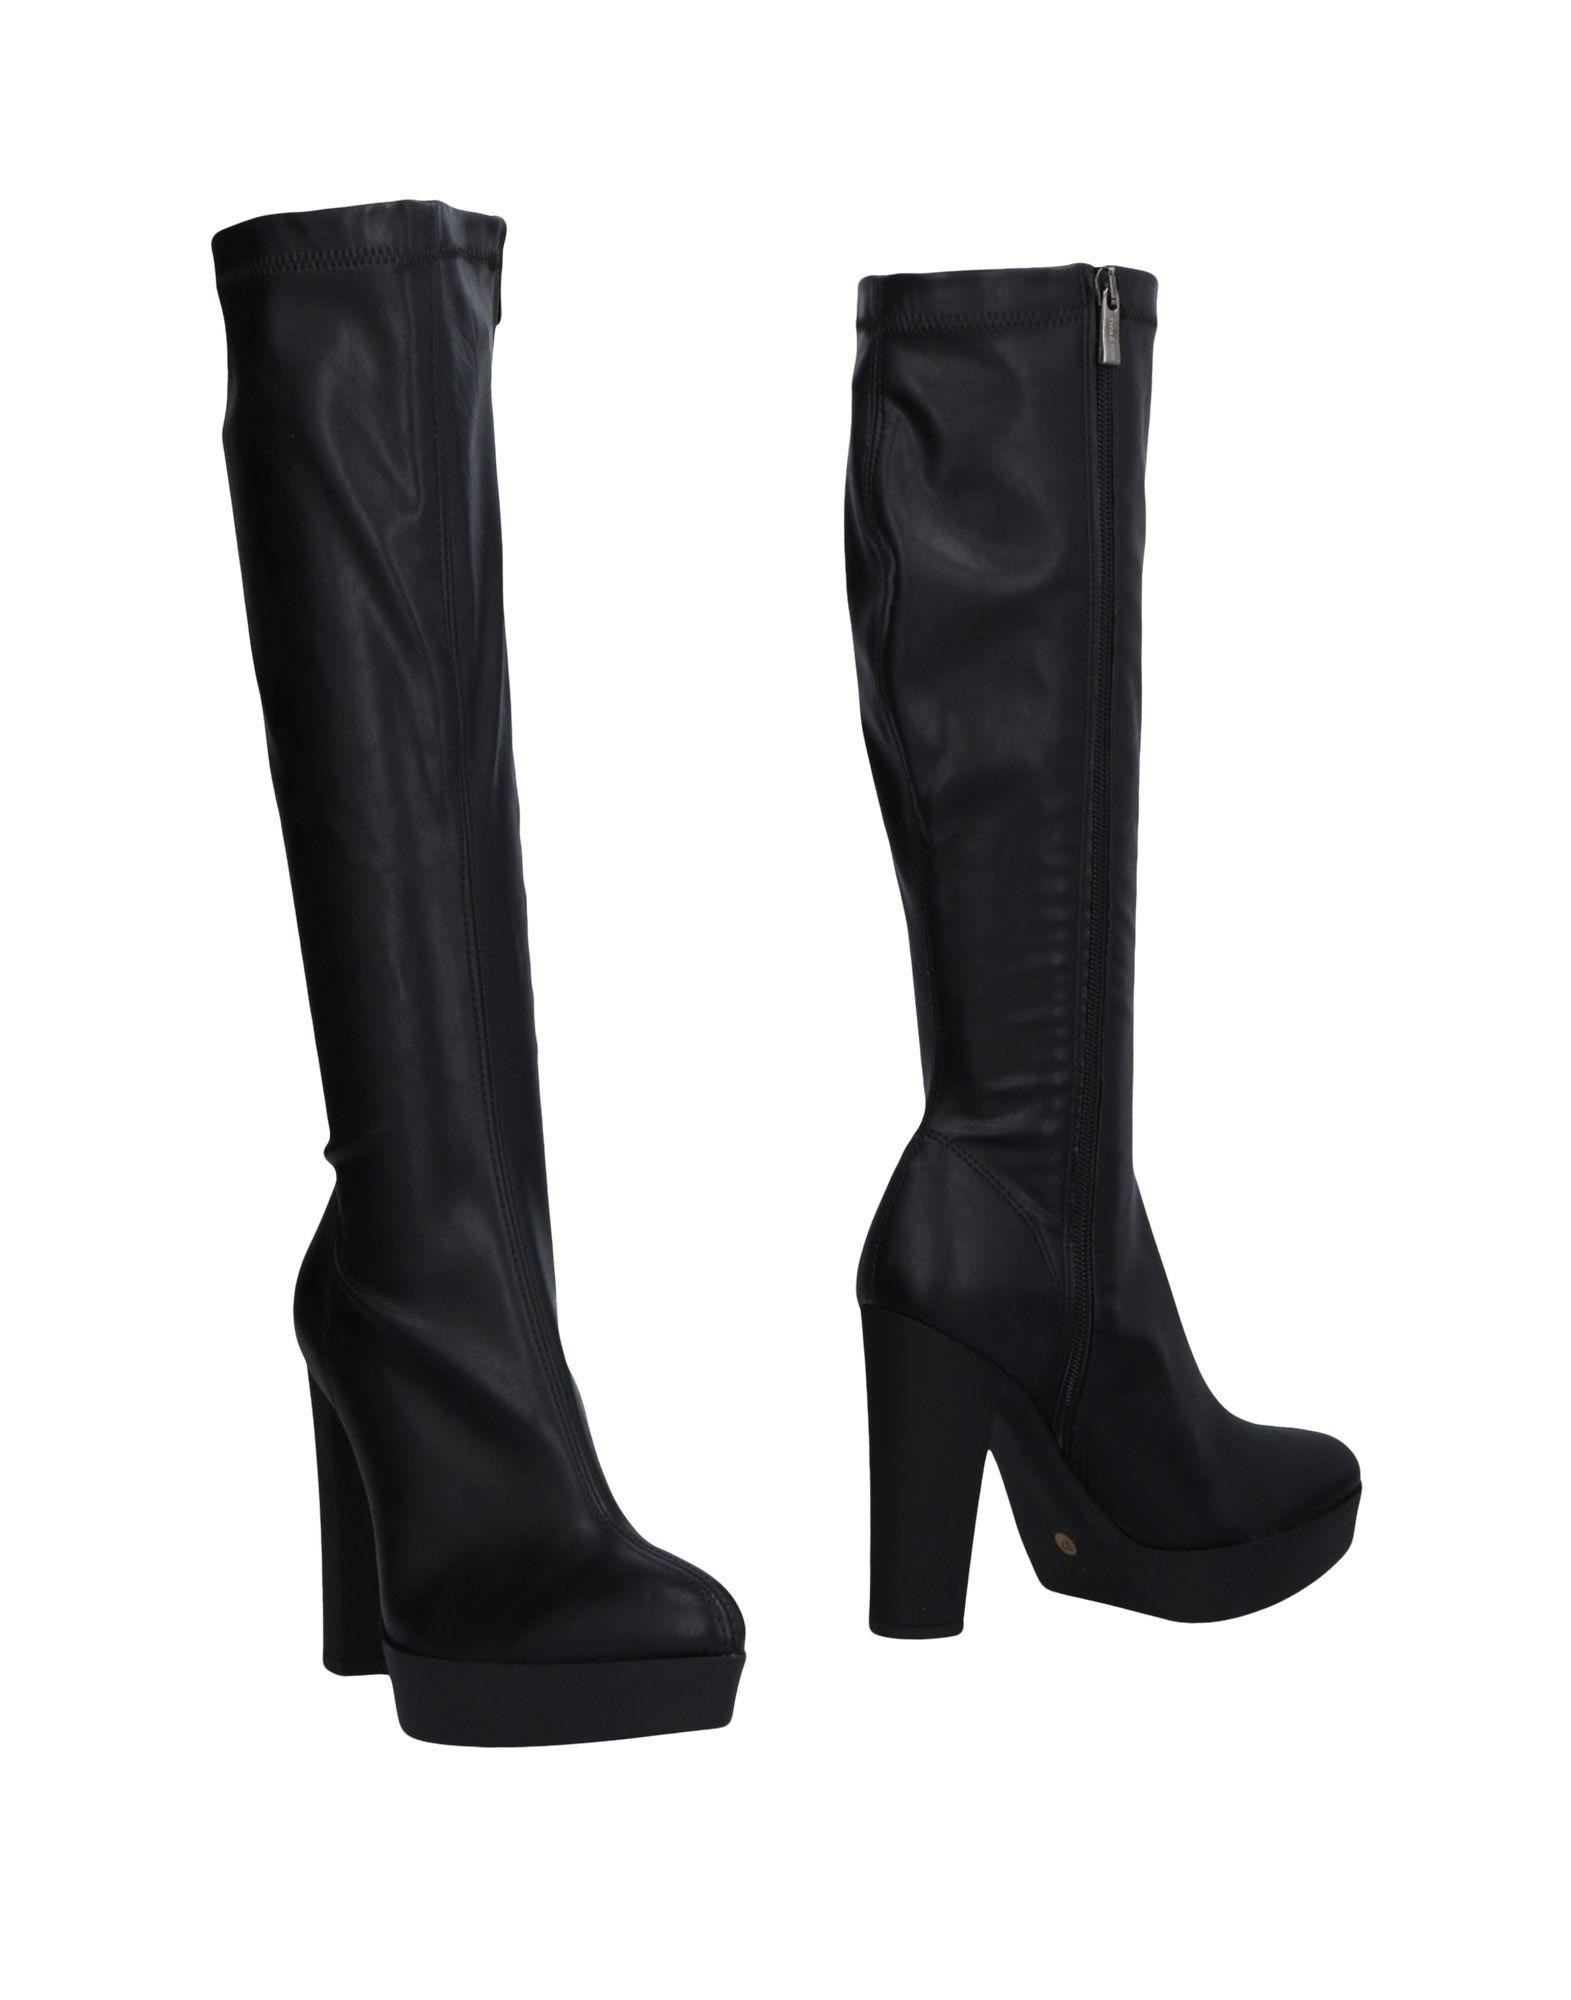 Nila & Nila Stiefel Neue Damen  11476833AR Neue Stiefel Schuhe bcefe5